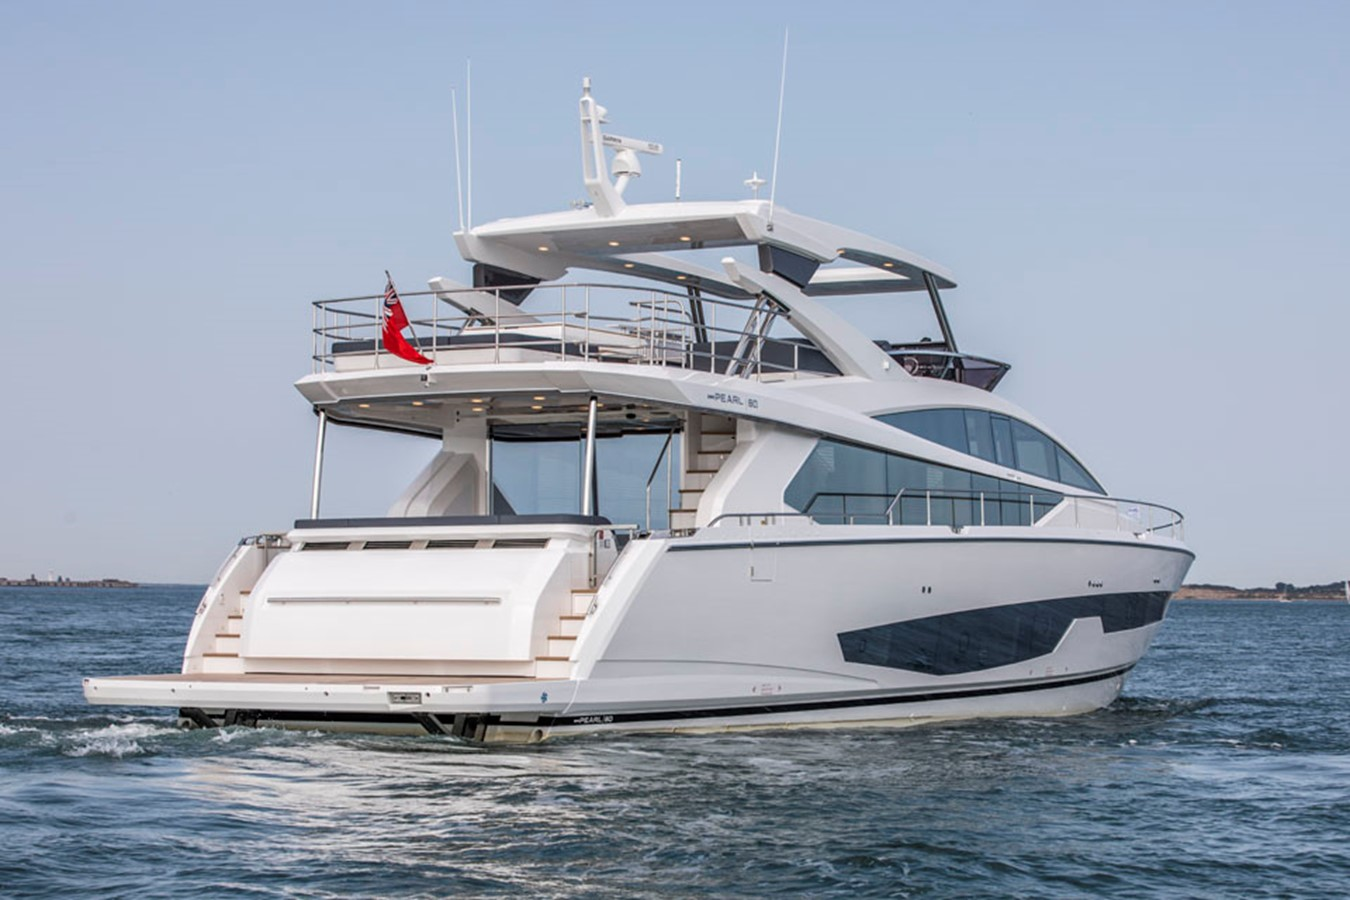 2019 PEARL MOTOR YACHTS Pearl 80 Motor Yacht 2615322